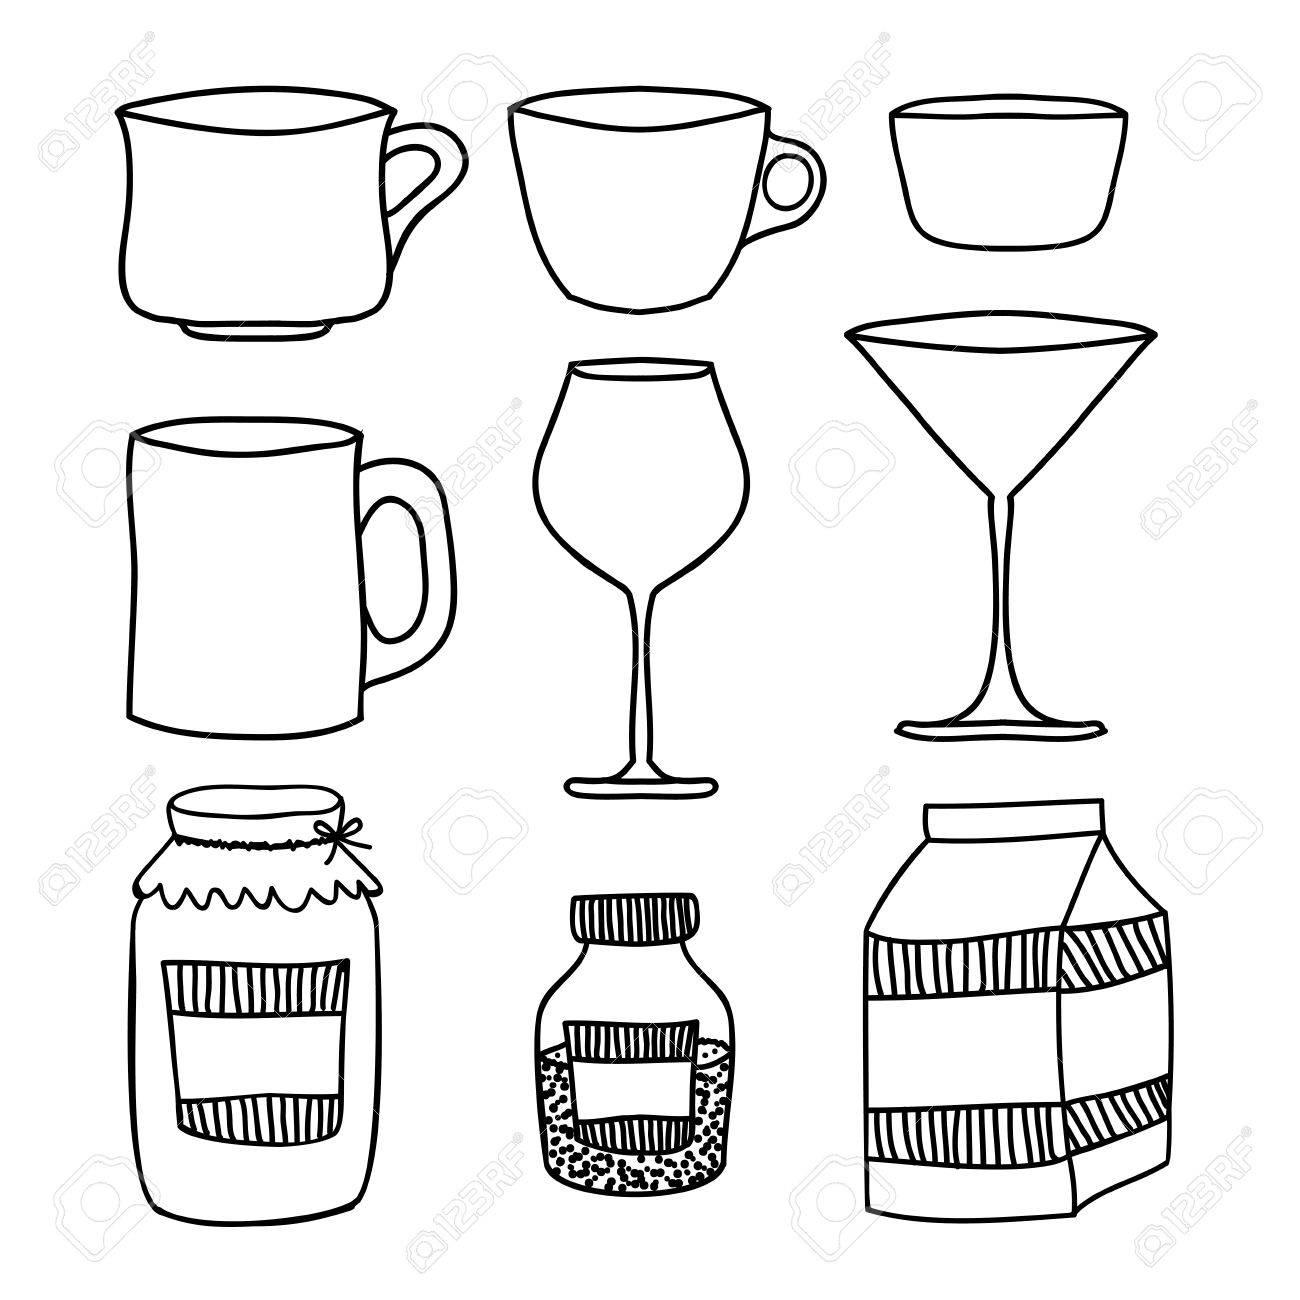 Kitchen Supplies Design Over White Background Vector Illustration